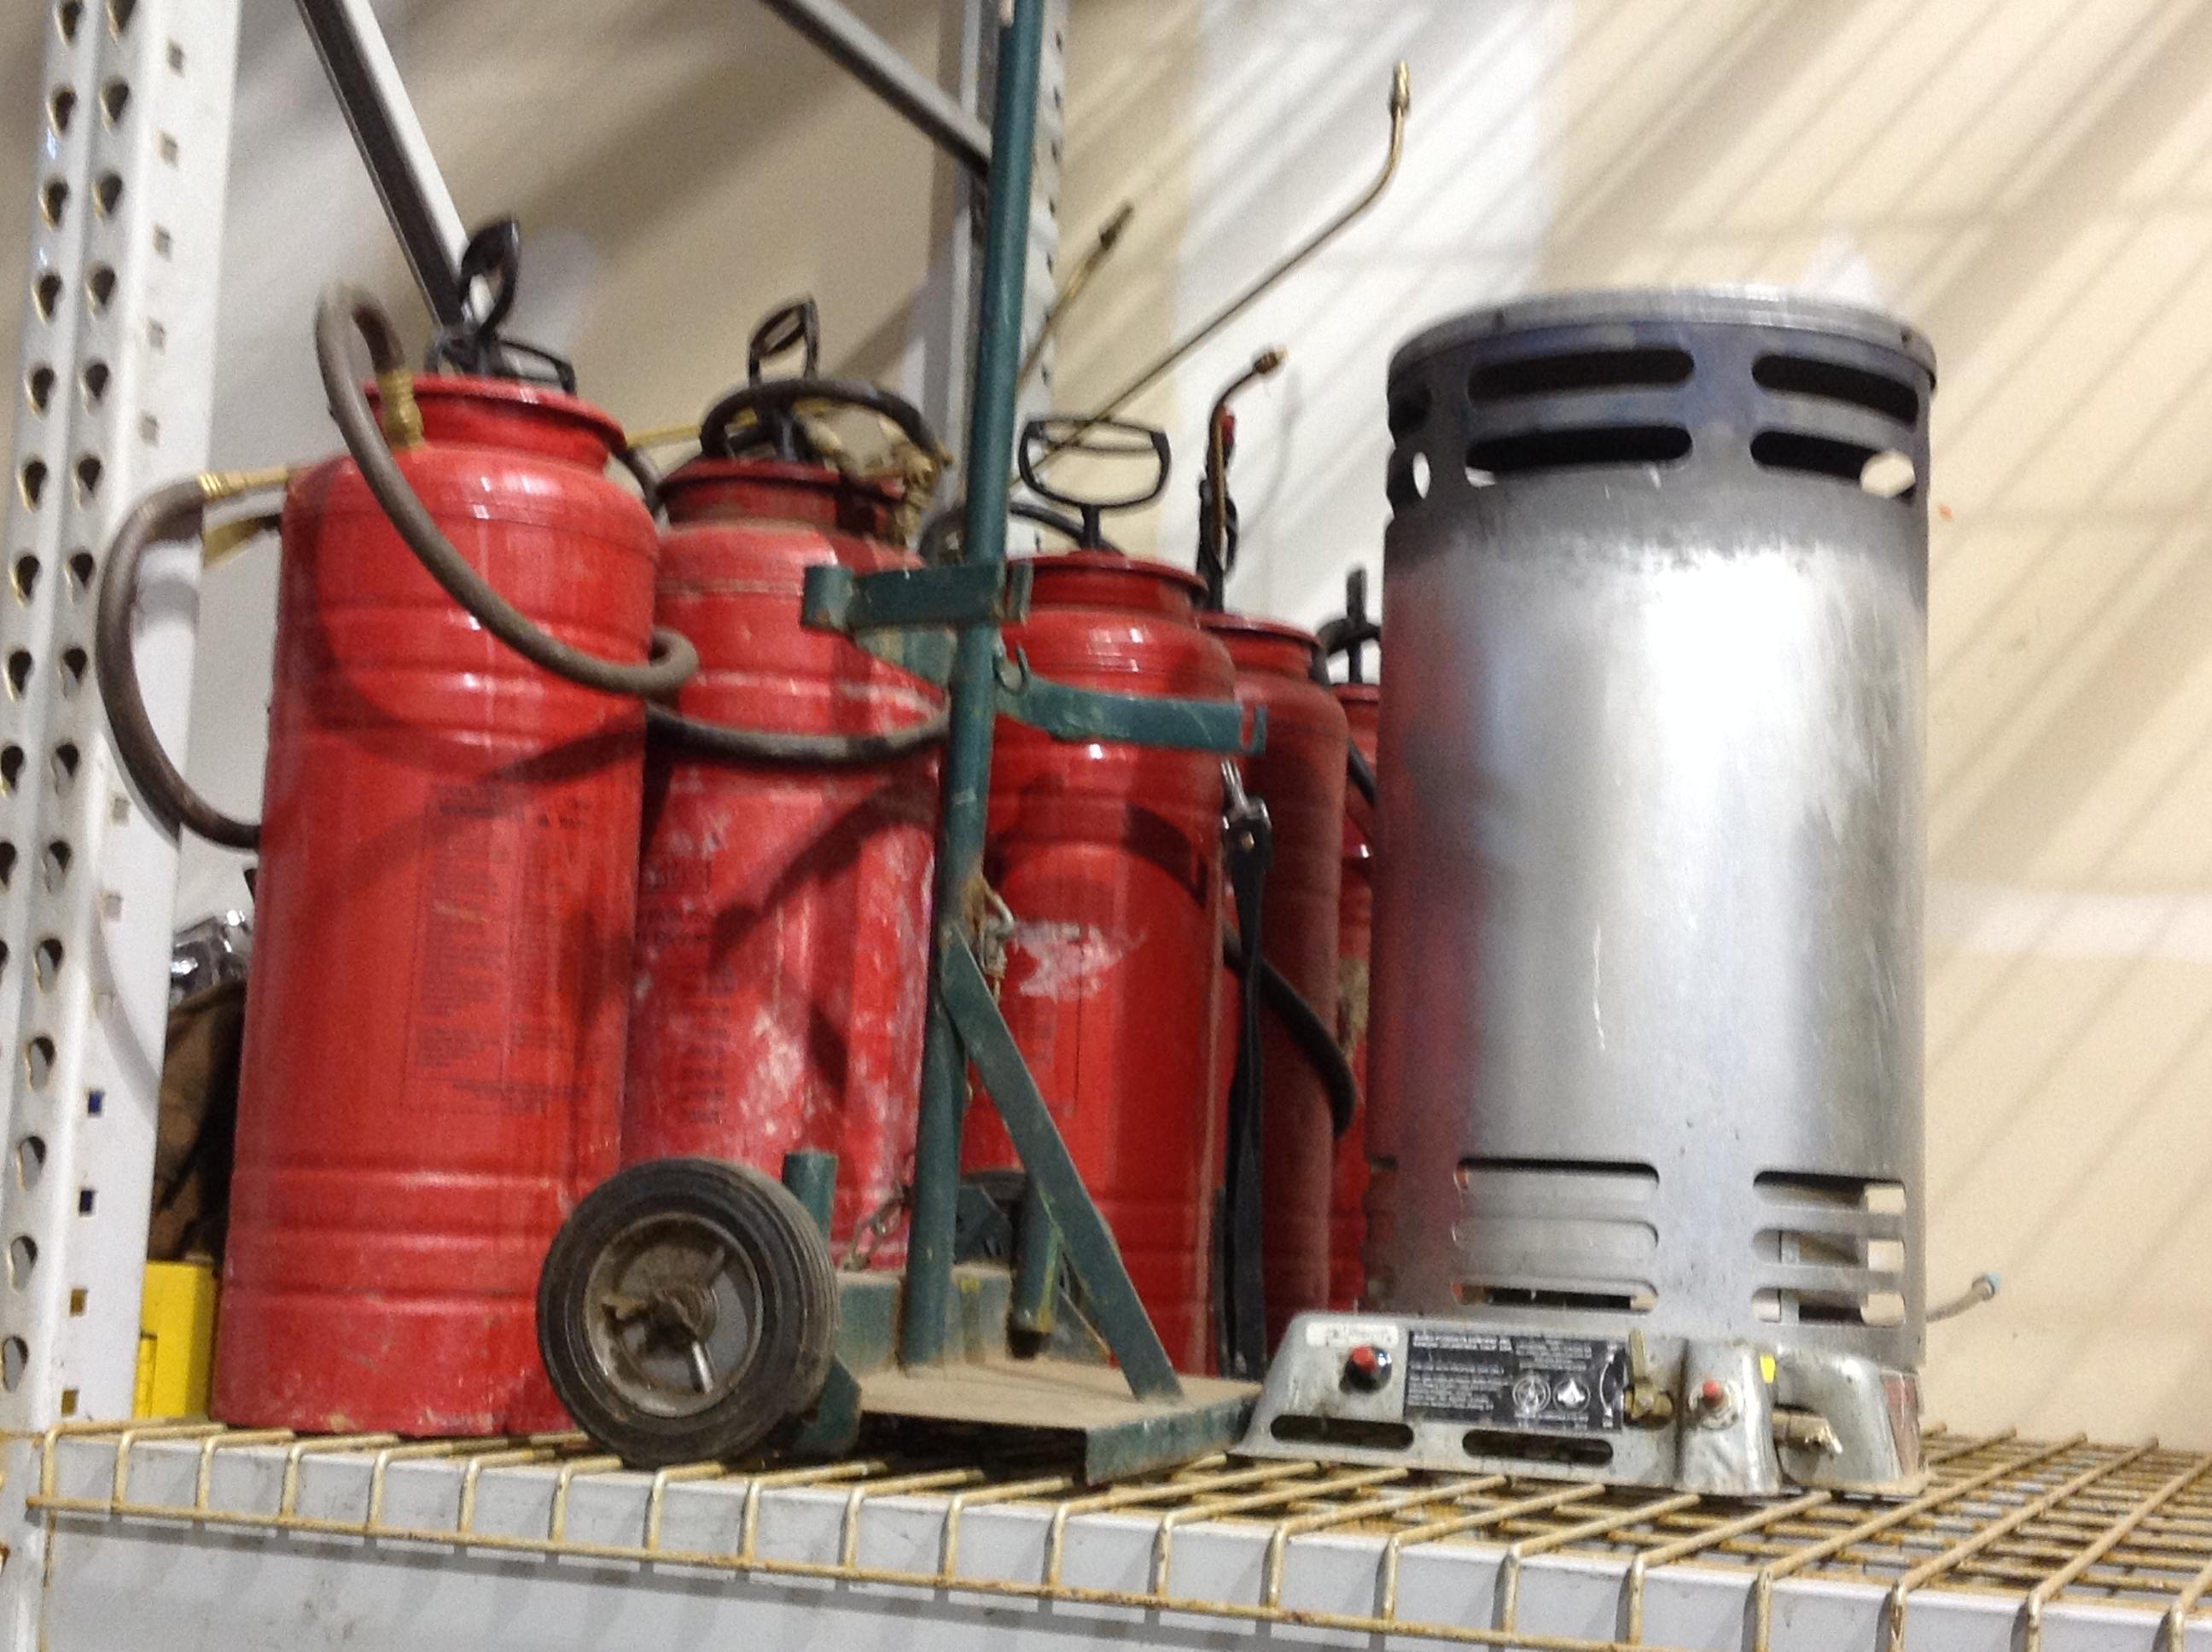 Form sprayers, heaters